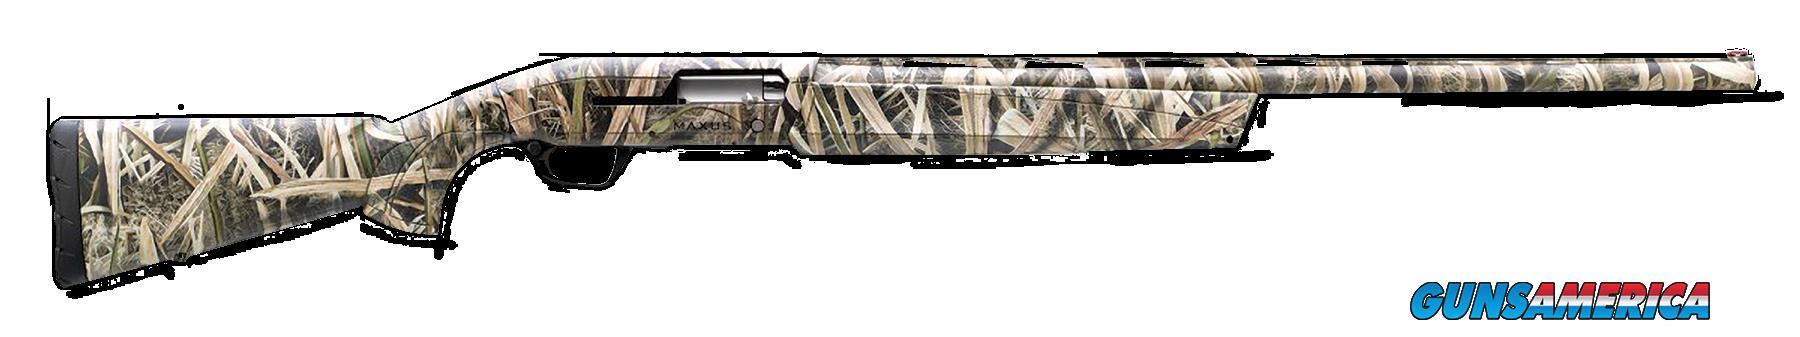 Browning Maxus, Brn 011-645204 Maxus     12 28 3.5 Msg  Guns > Pistols > 1911 Pistol Copies (non-Colt)